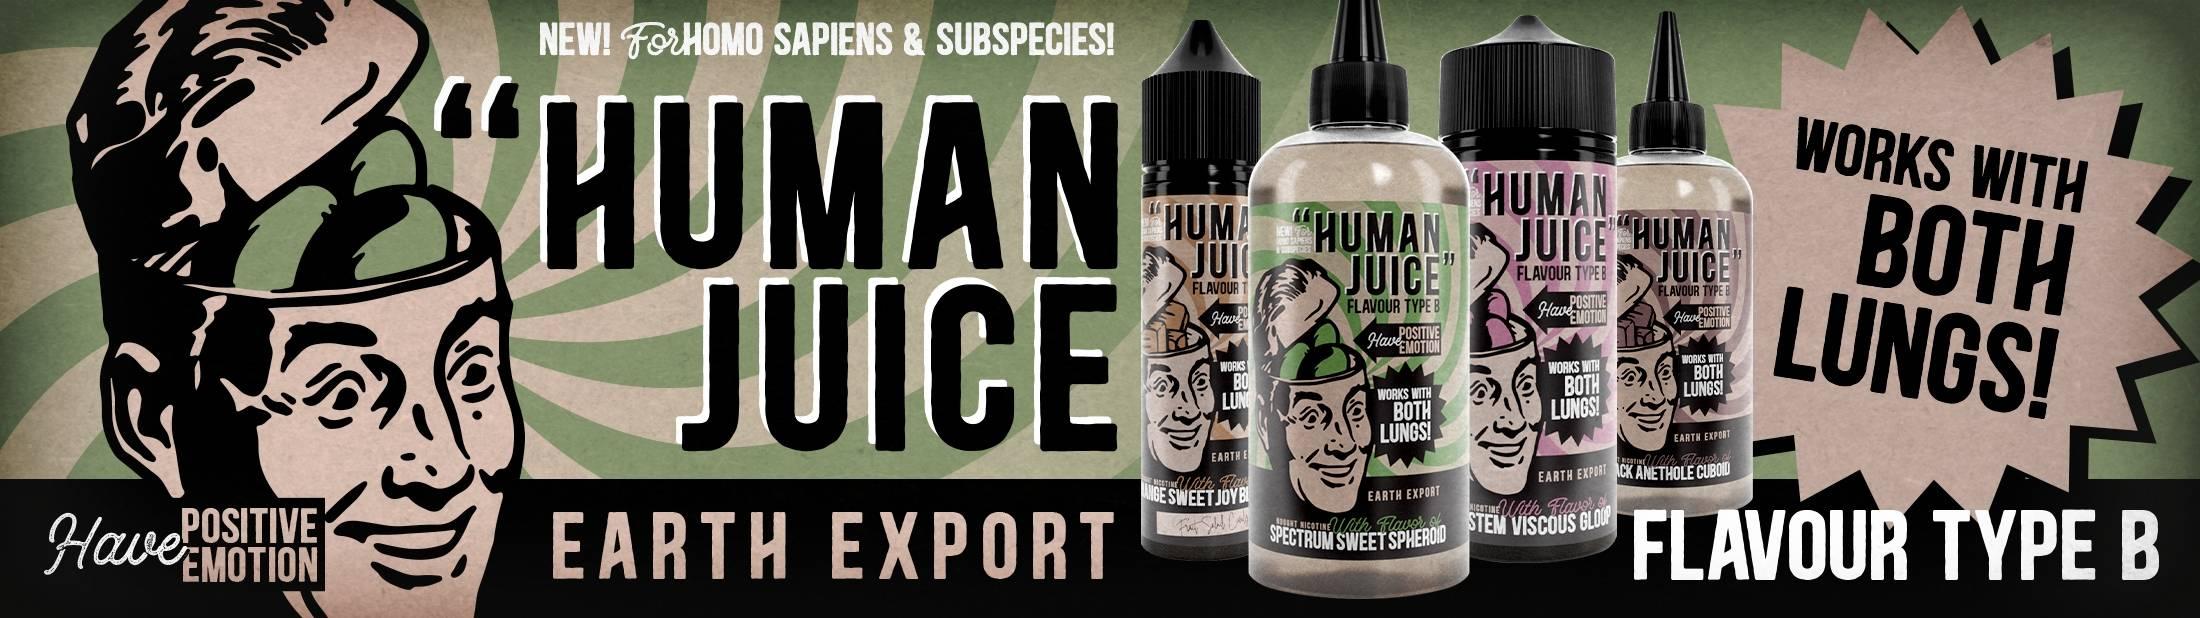 Human Juice - Flavour Type B